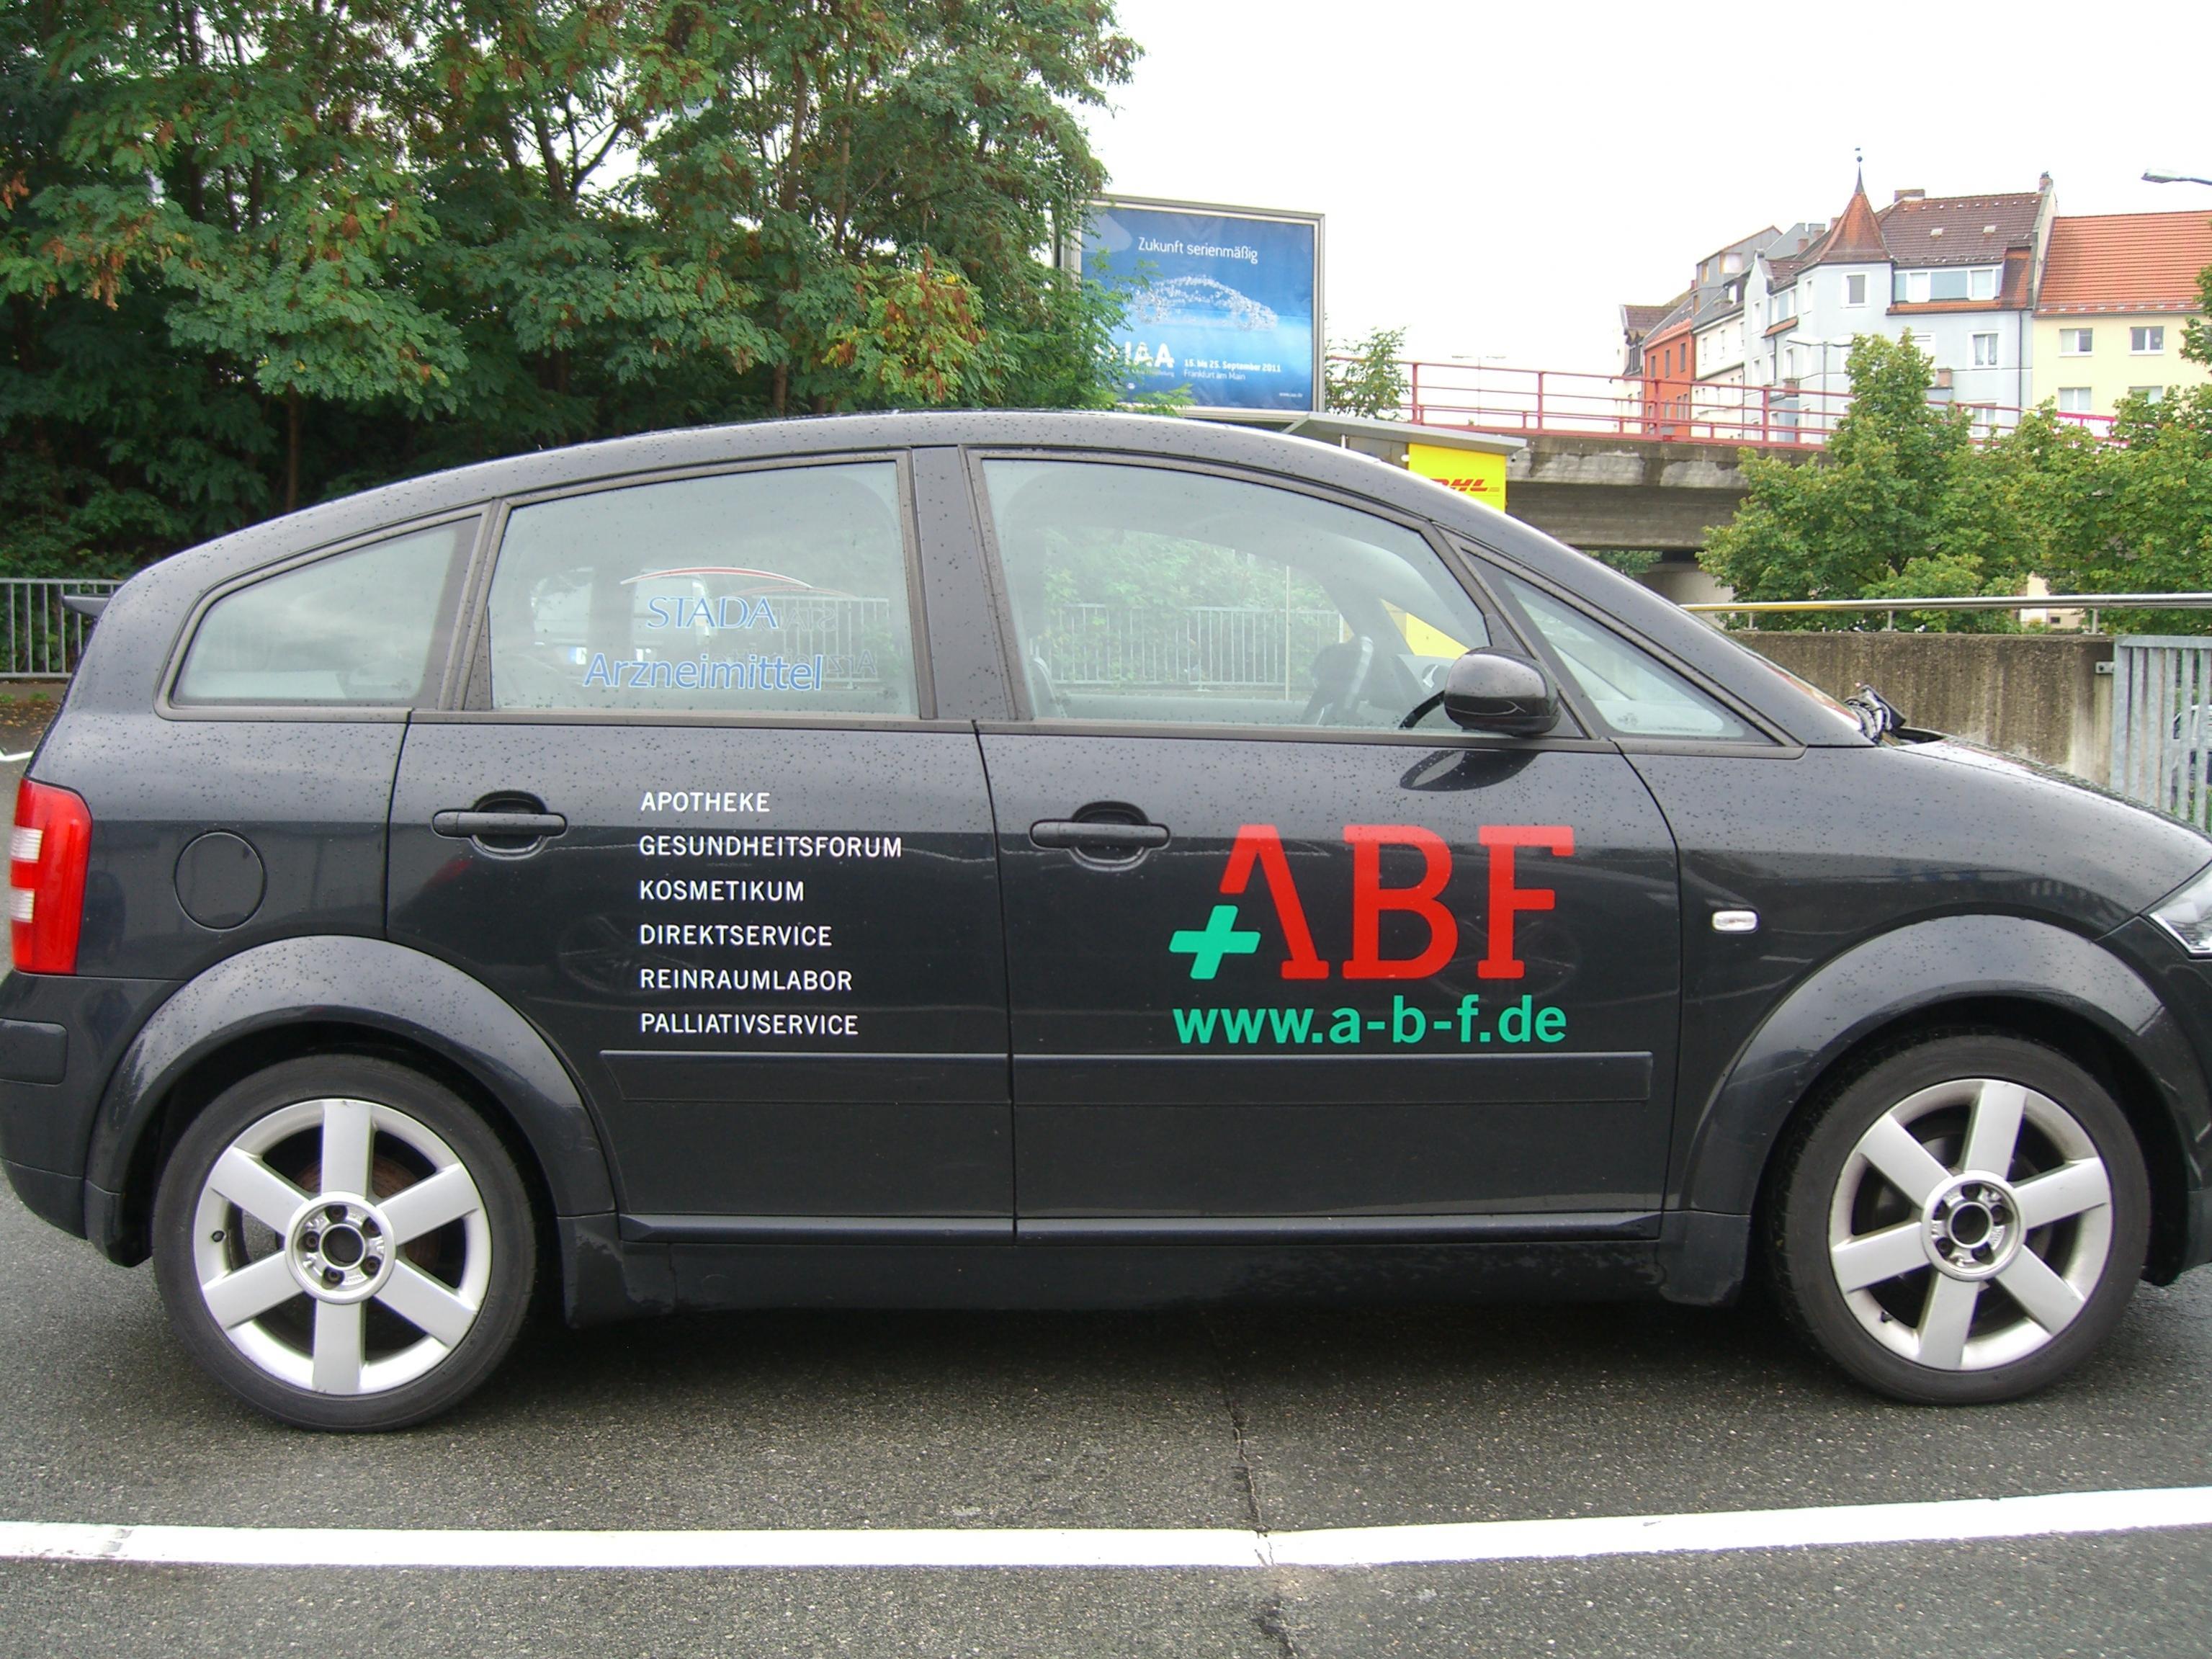 A2-Firmenwagen-CIMG7977_cleaned.jpg.6db57076254293f097b7abe698361492.jpg